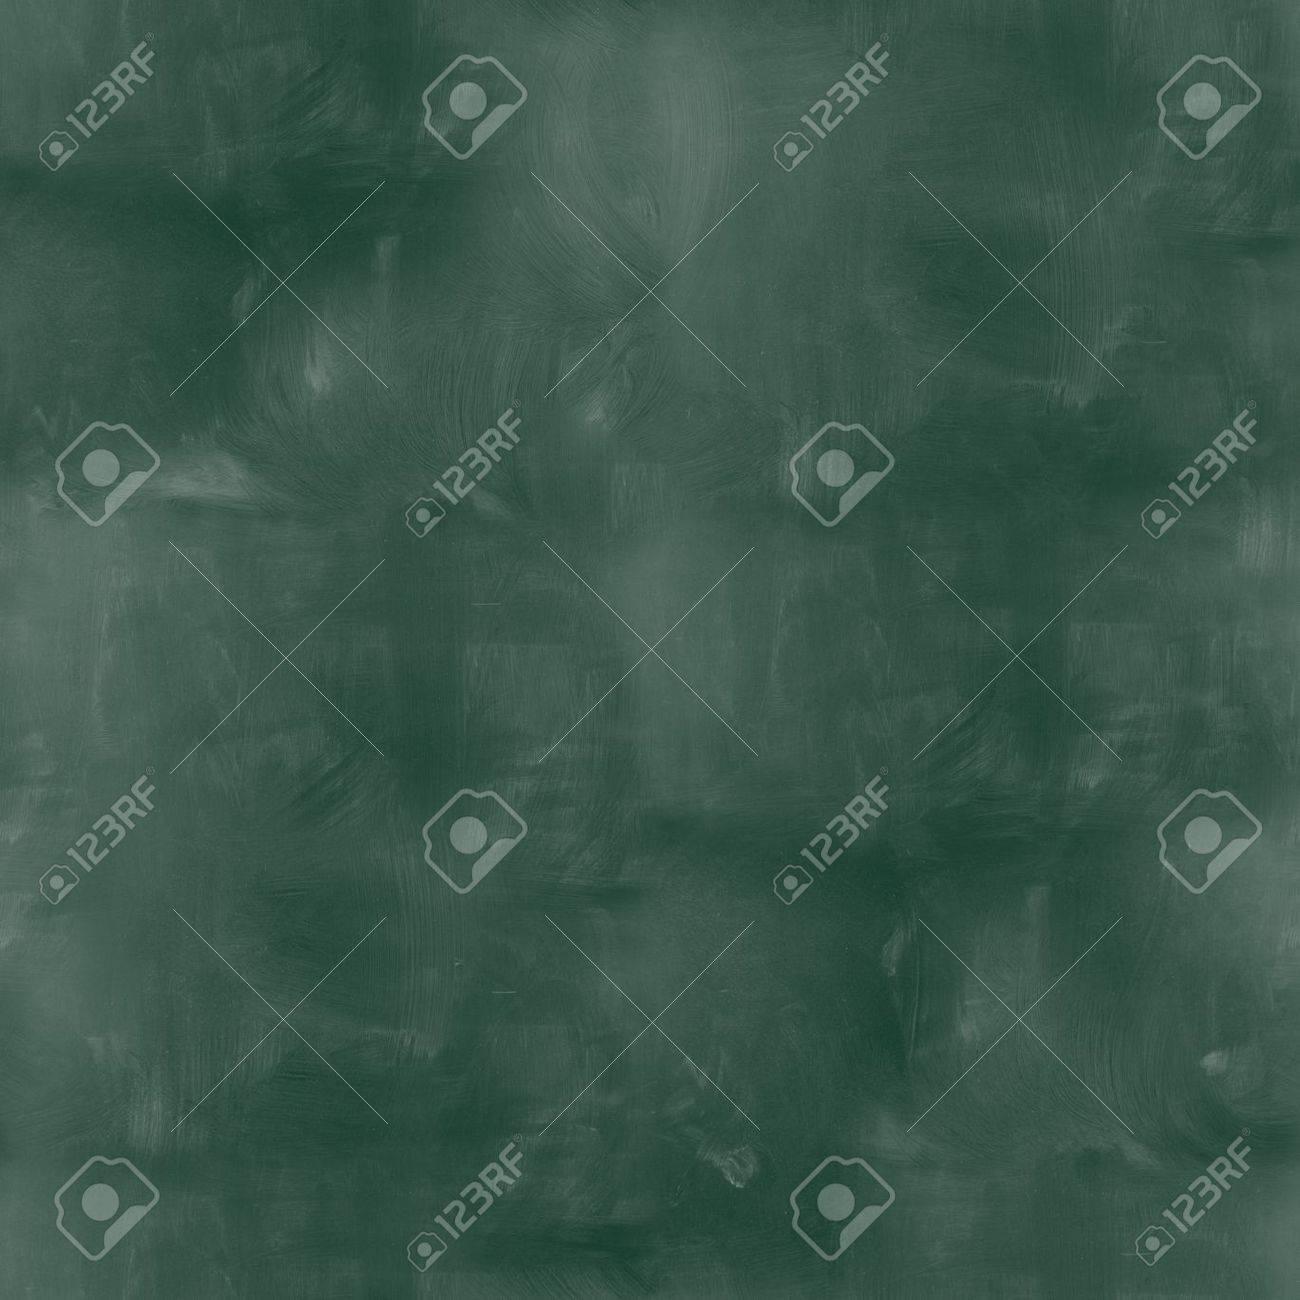 seamless green chalkboard texture stock photo 15447605